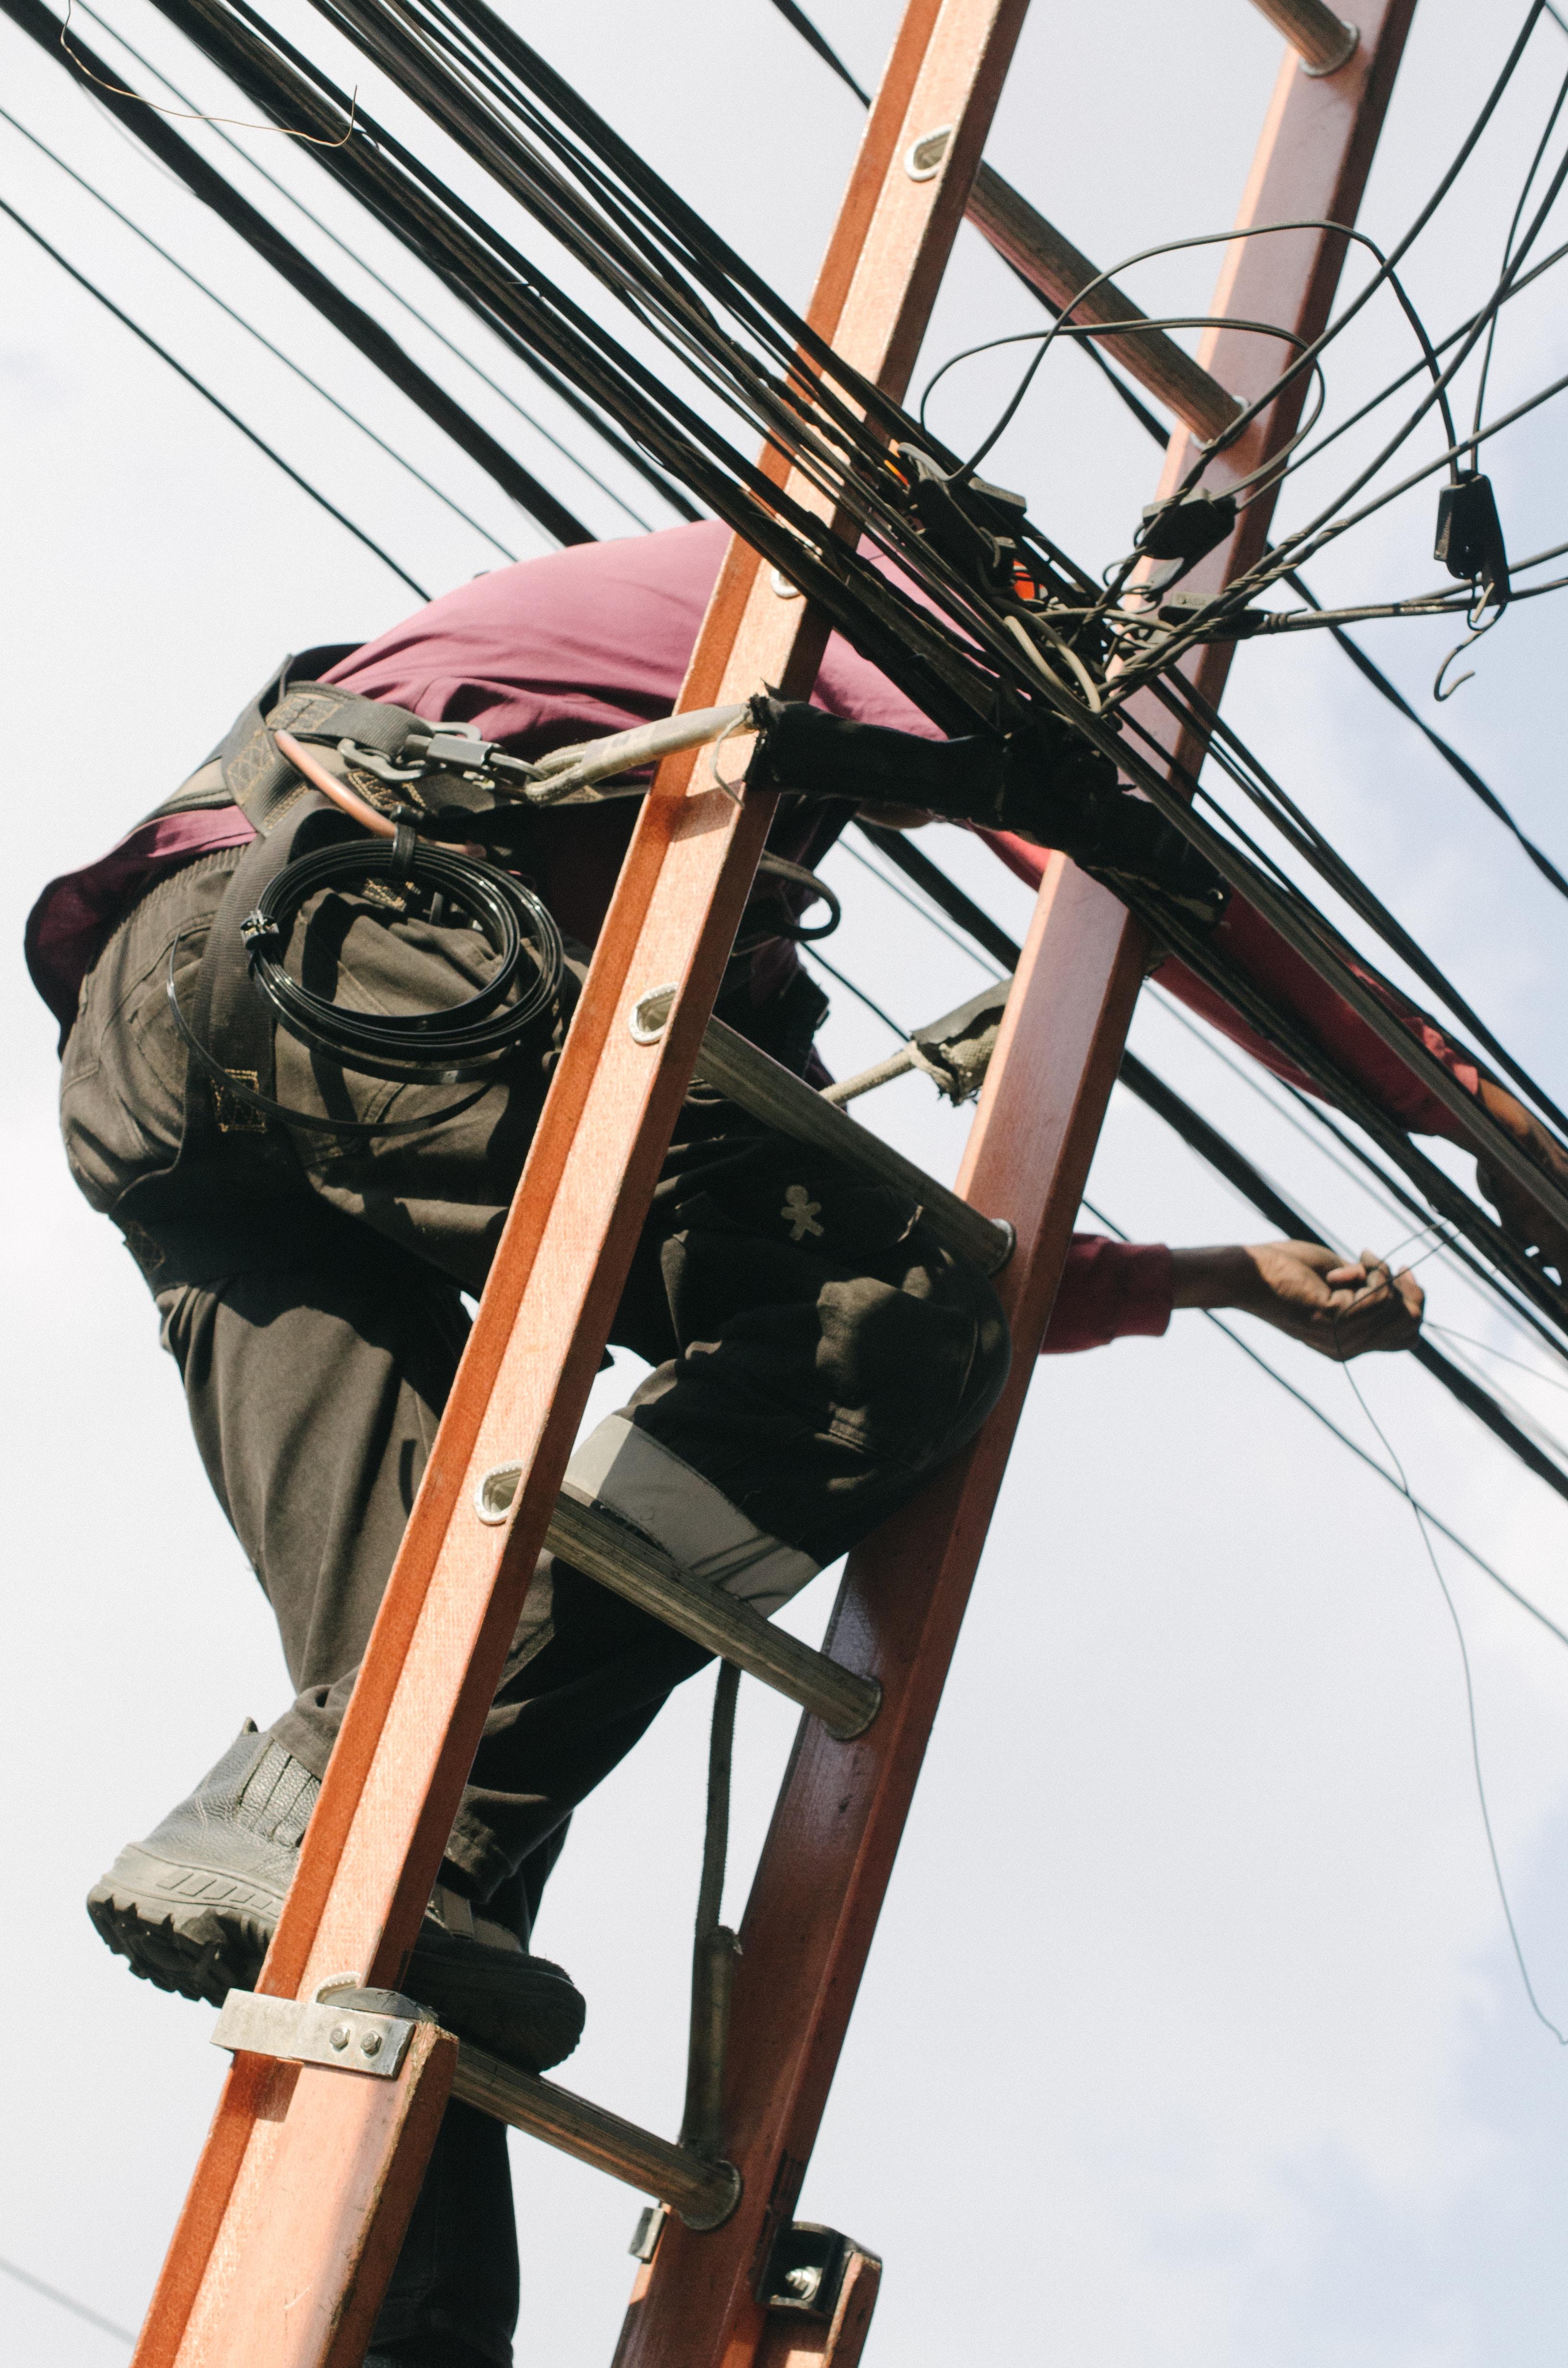 chris wiring harness free download data wiring diagram updateChris Wiring Harness Free Download #19